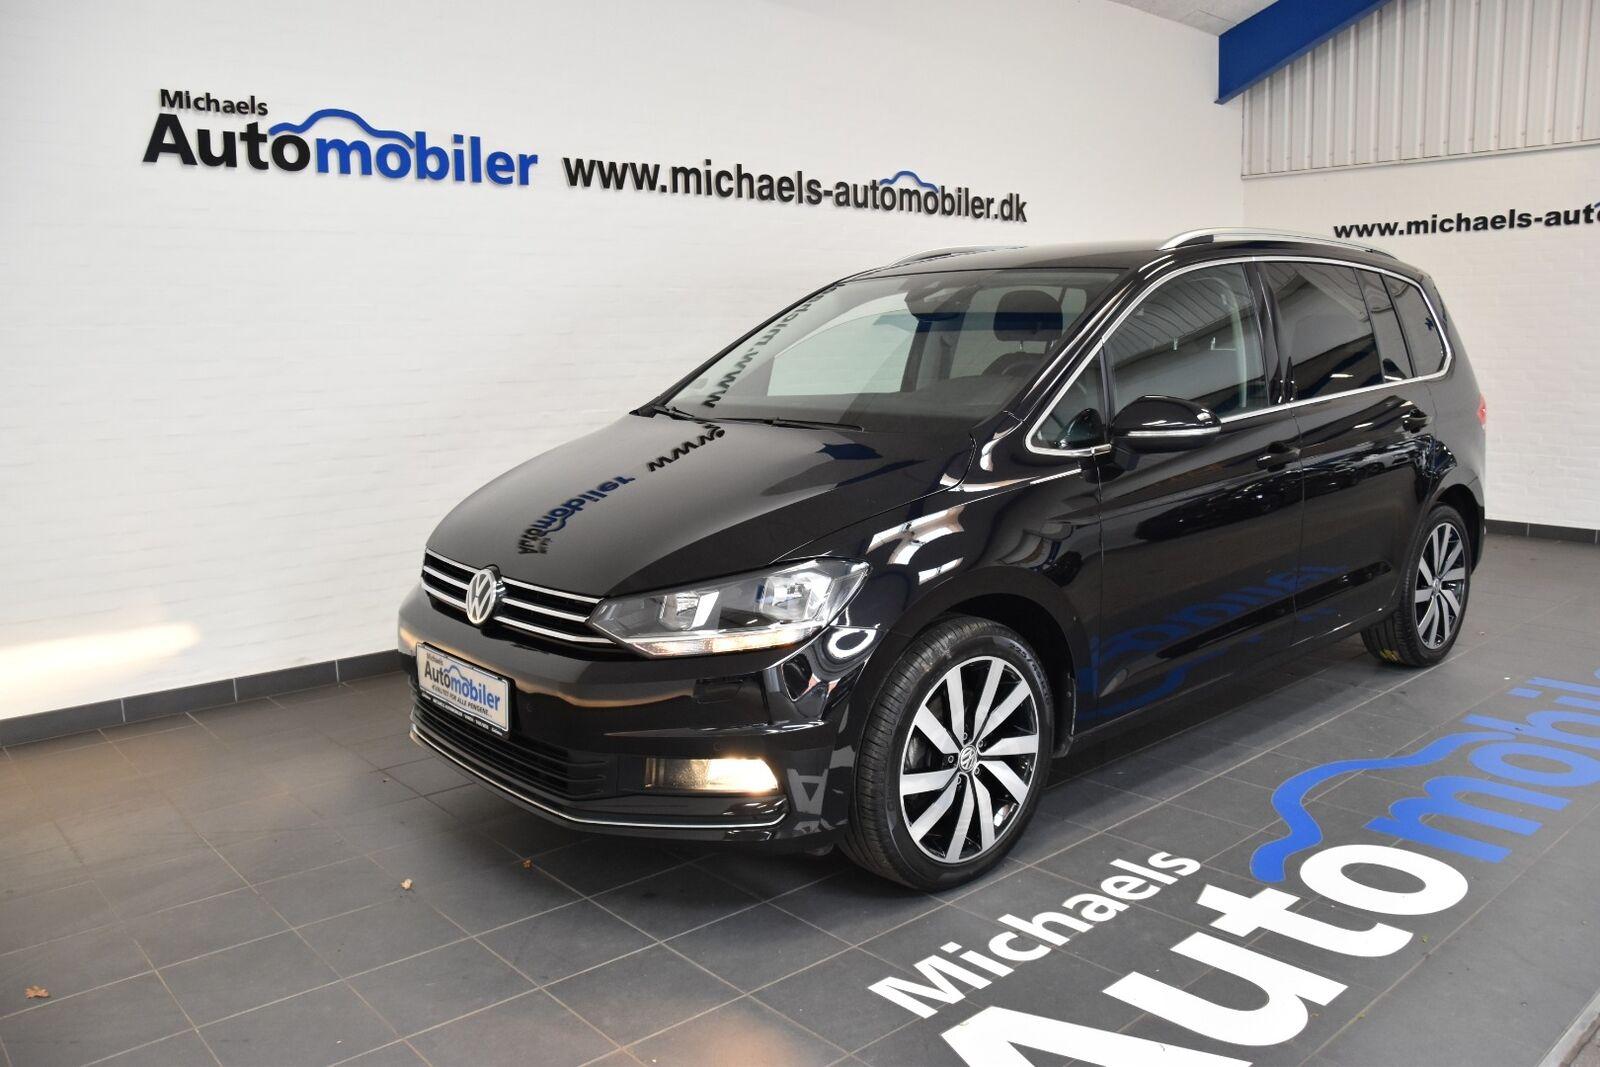 VW Touran 2,0 TDi 150 Highline DSG 7prs 5d - 379.900 kr.